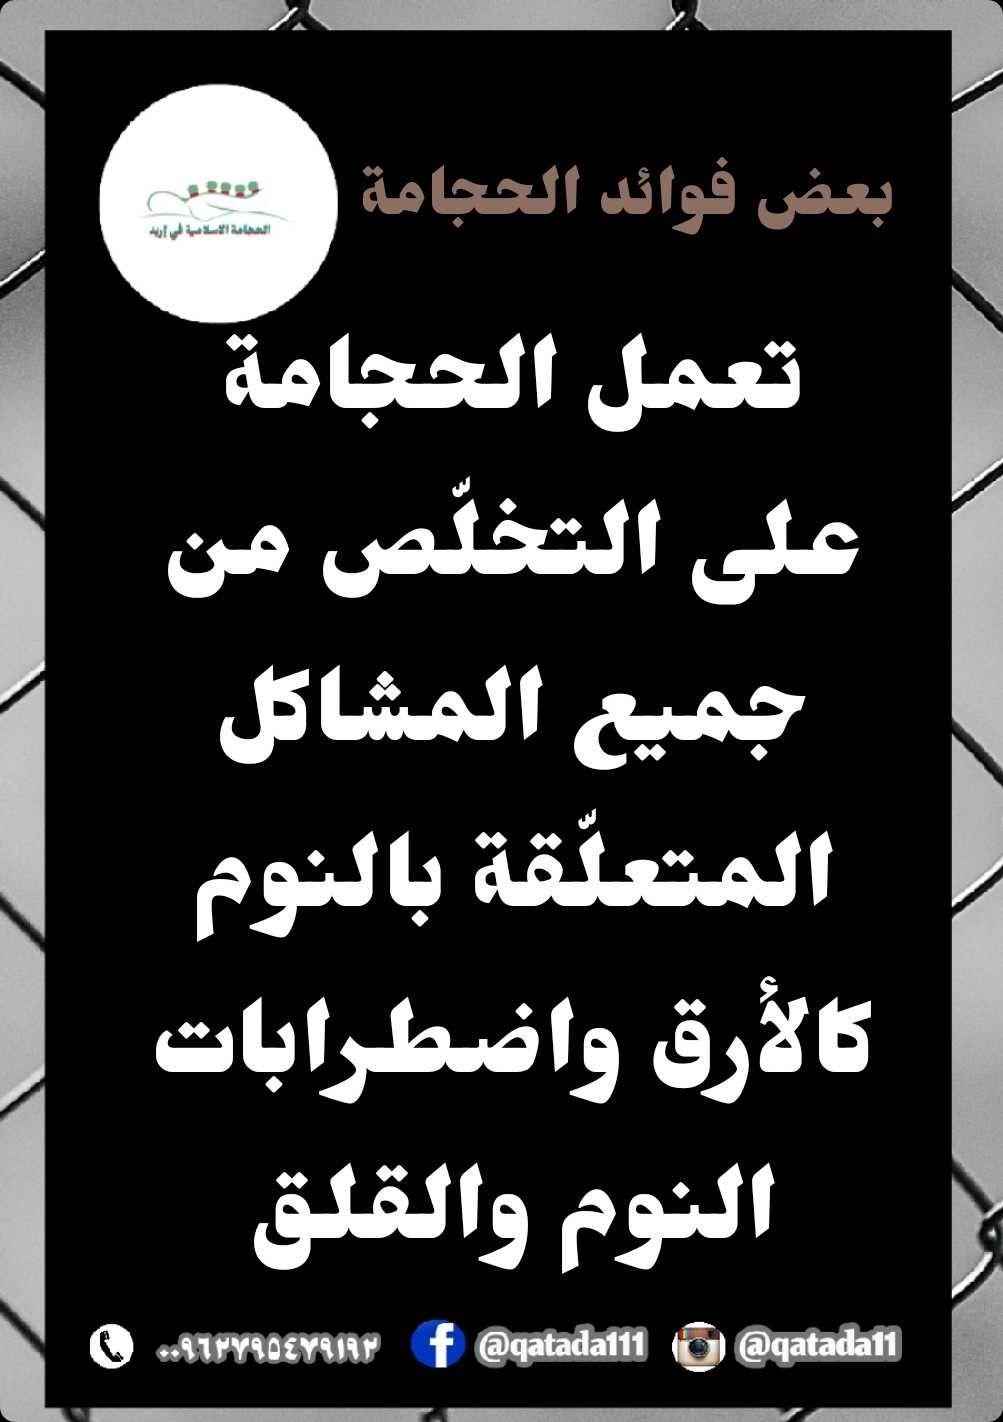 Pin By الحجامة الإسلامية On فوائد الحجامة Math Calligraphy Arabic Calligraphy